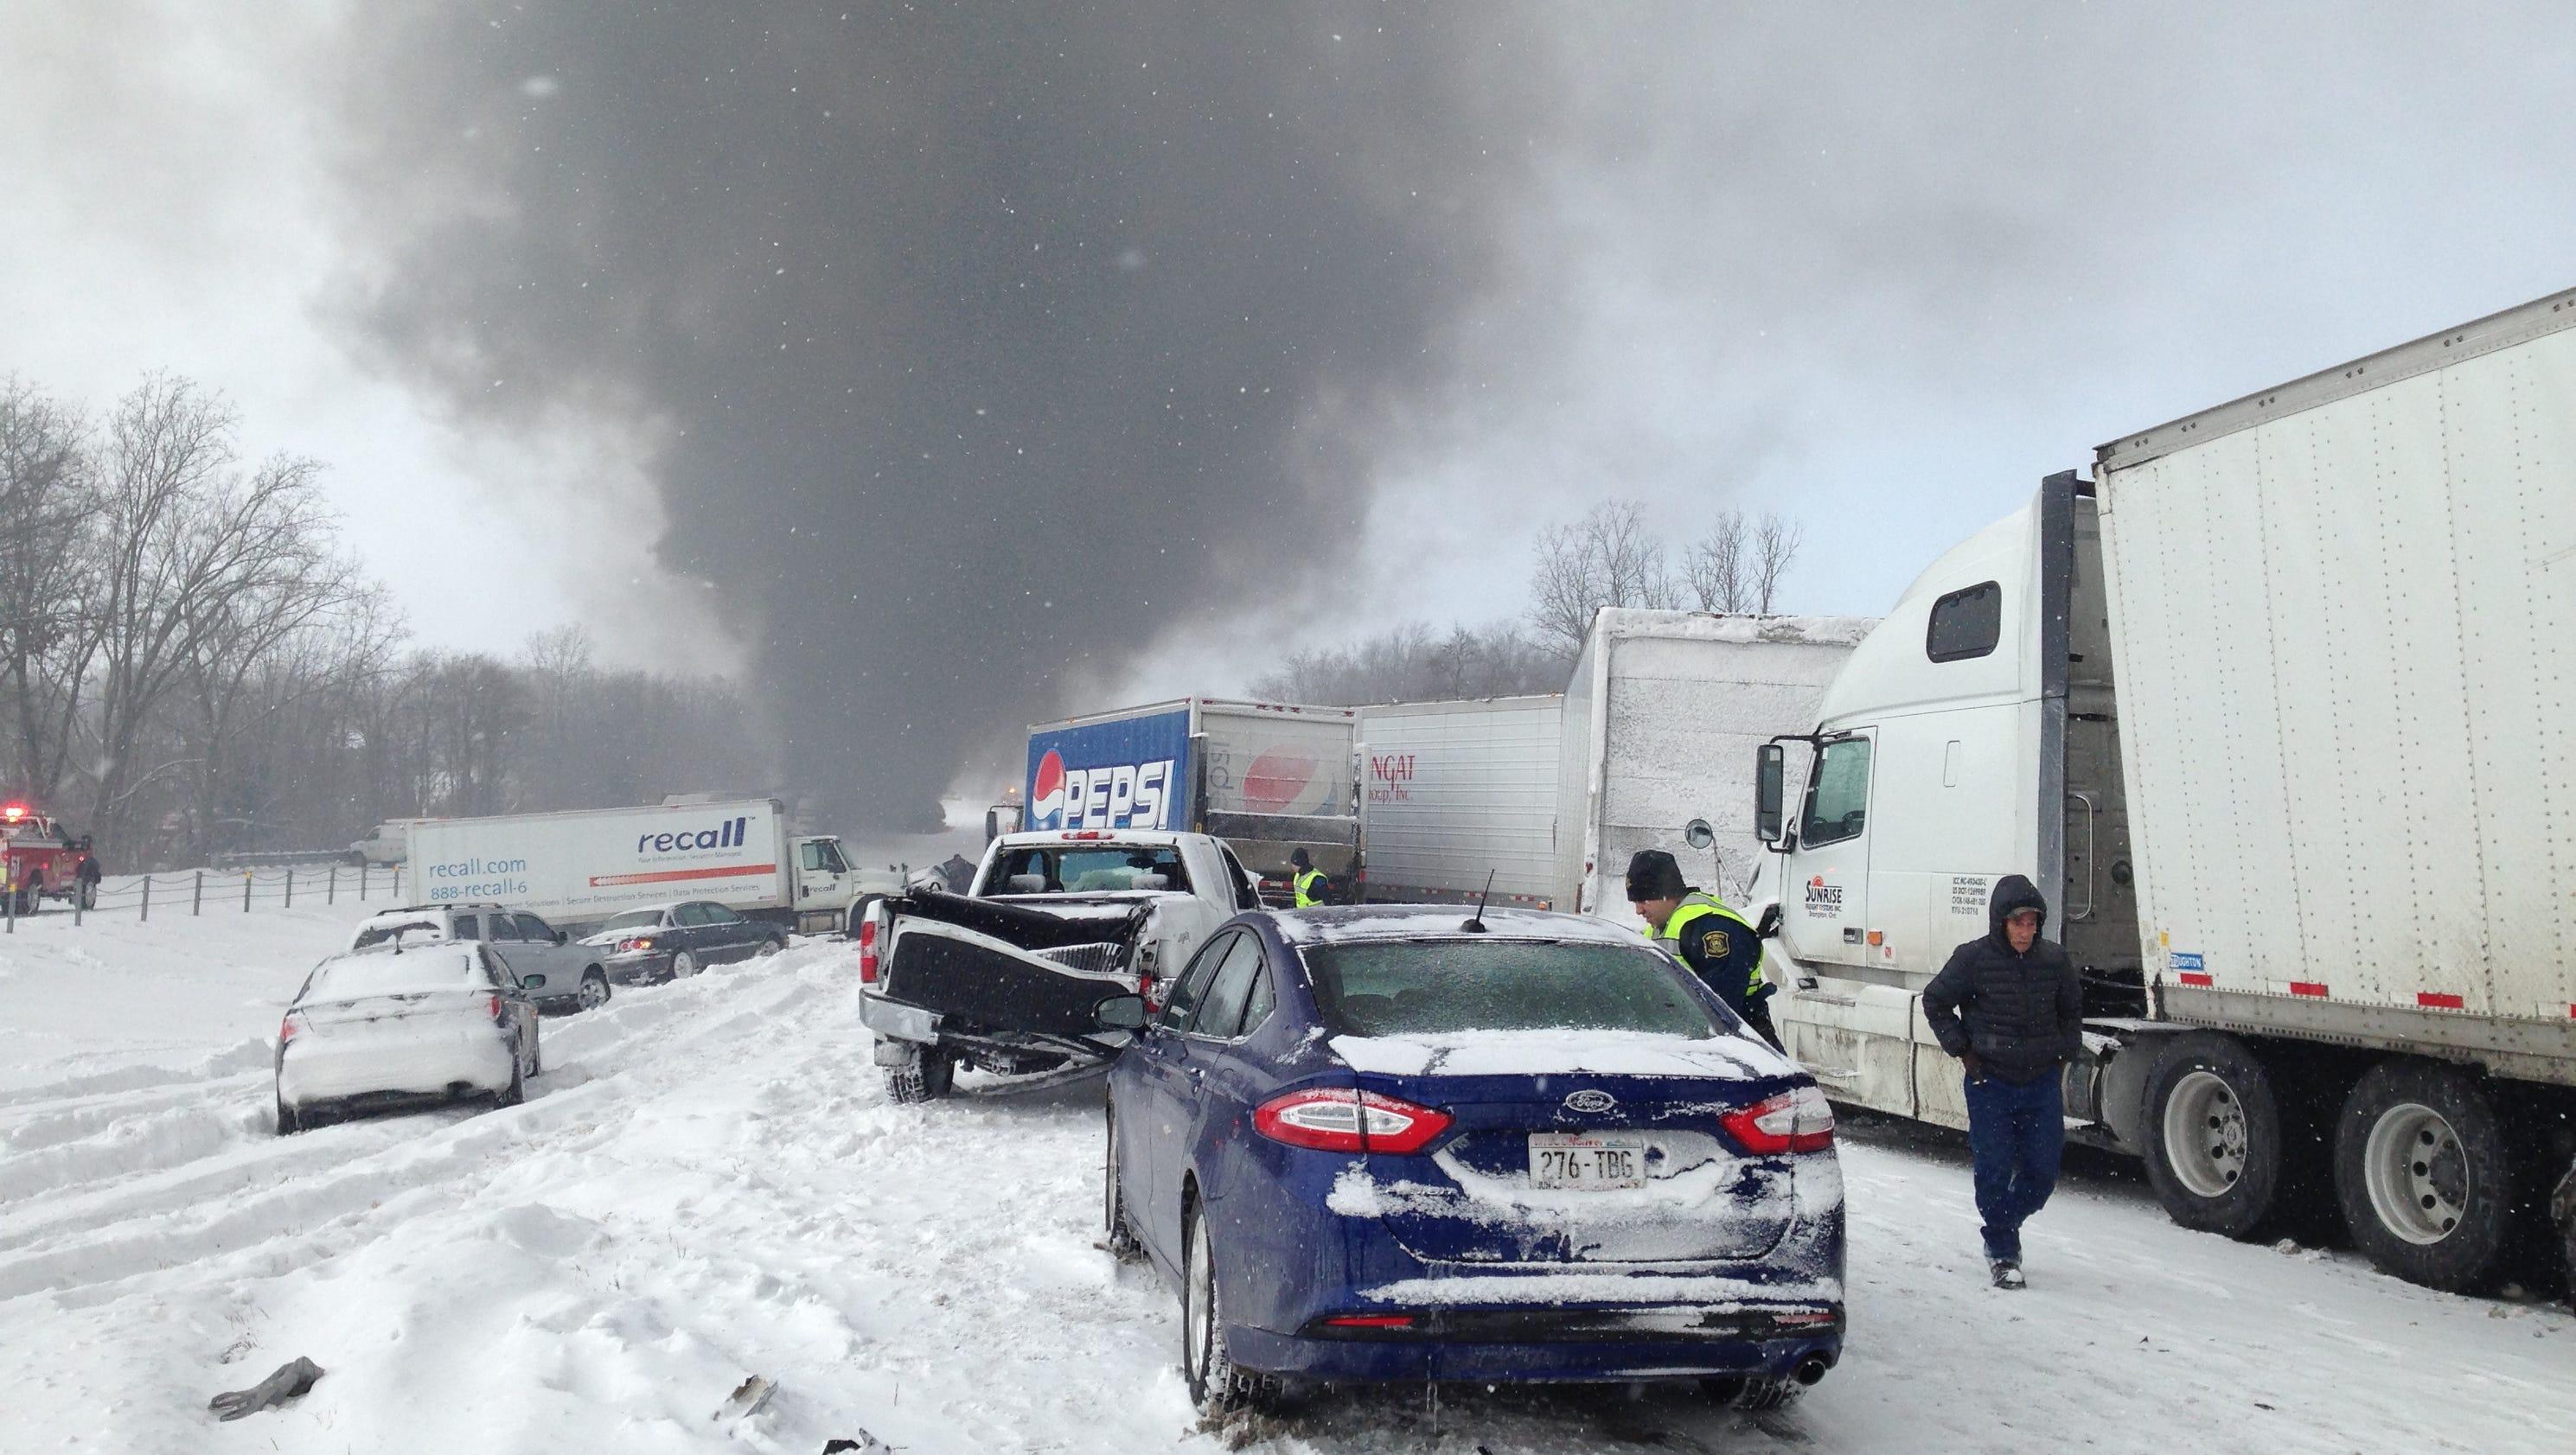 3 dead in 30-40 vehicle pileup on Michigan interstate